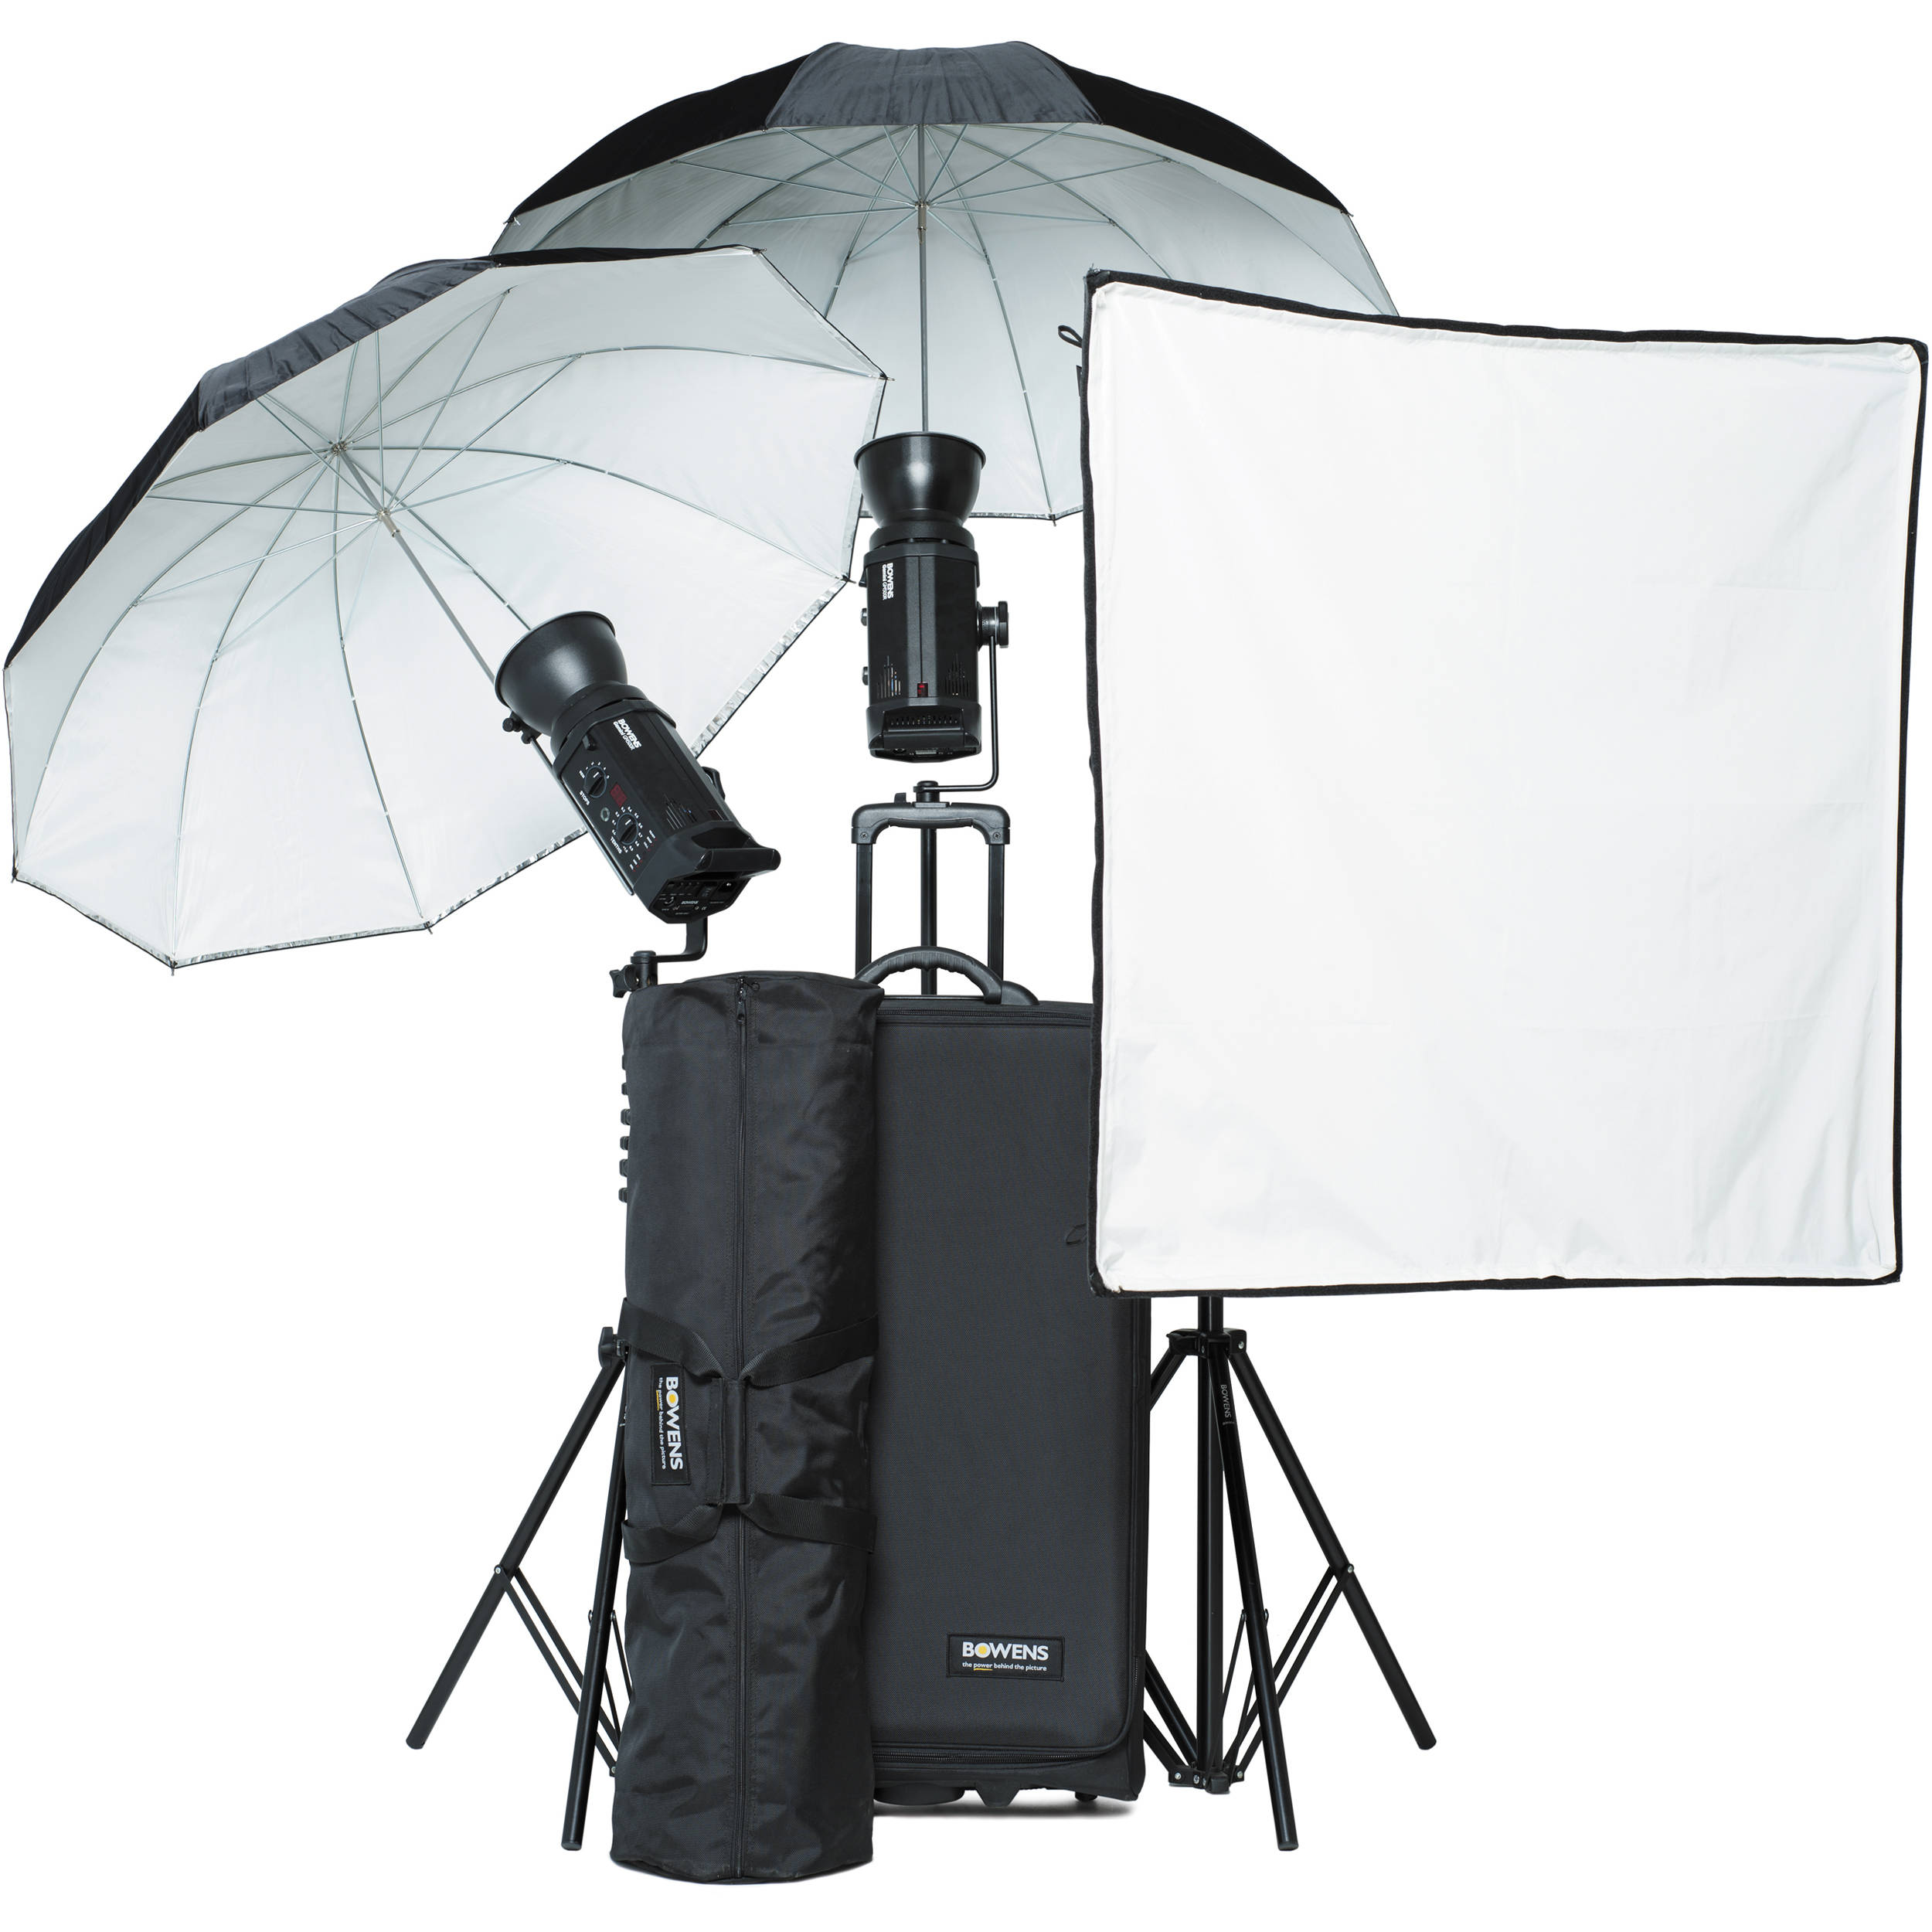 Bowens Esprit 500 Studio Lighting Kit: Bowens Gemini 500R PW 3-Light Kit BW-8515USP B&H Photo Video